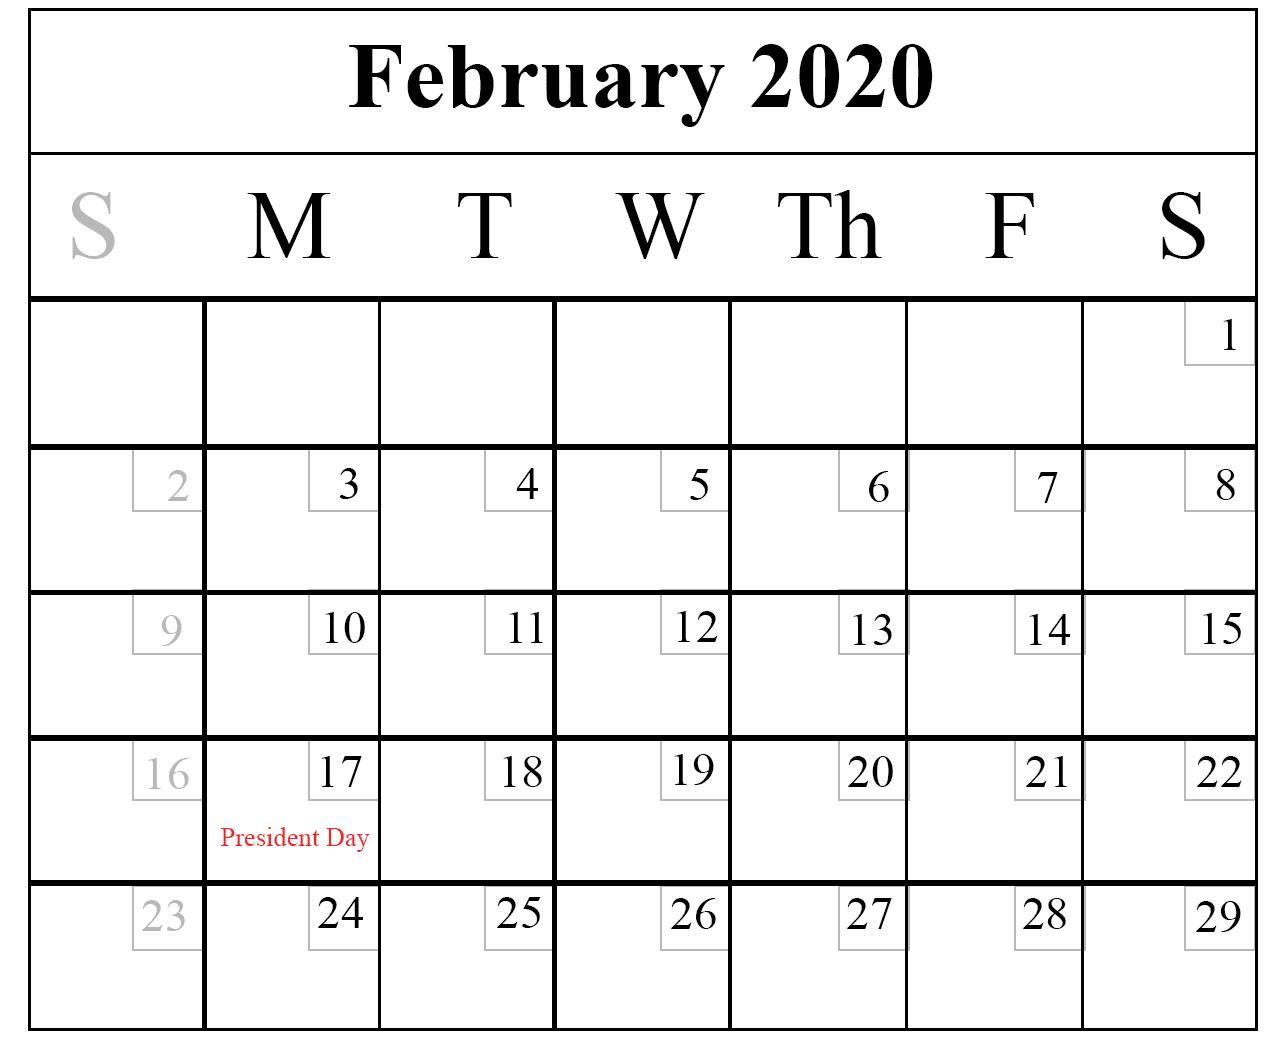 February Calendar 2020 Printable